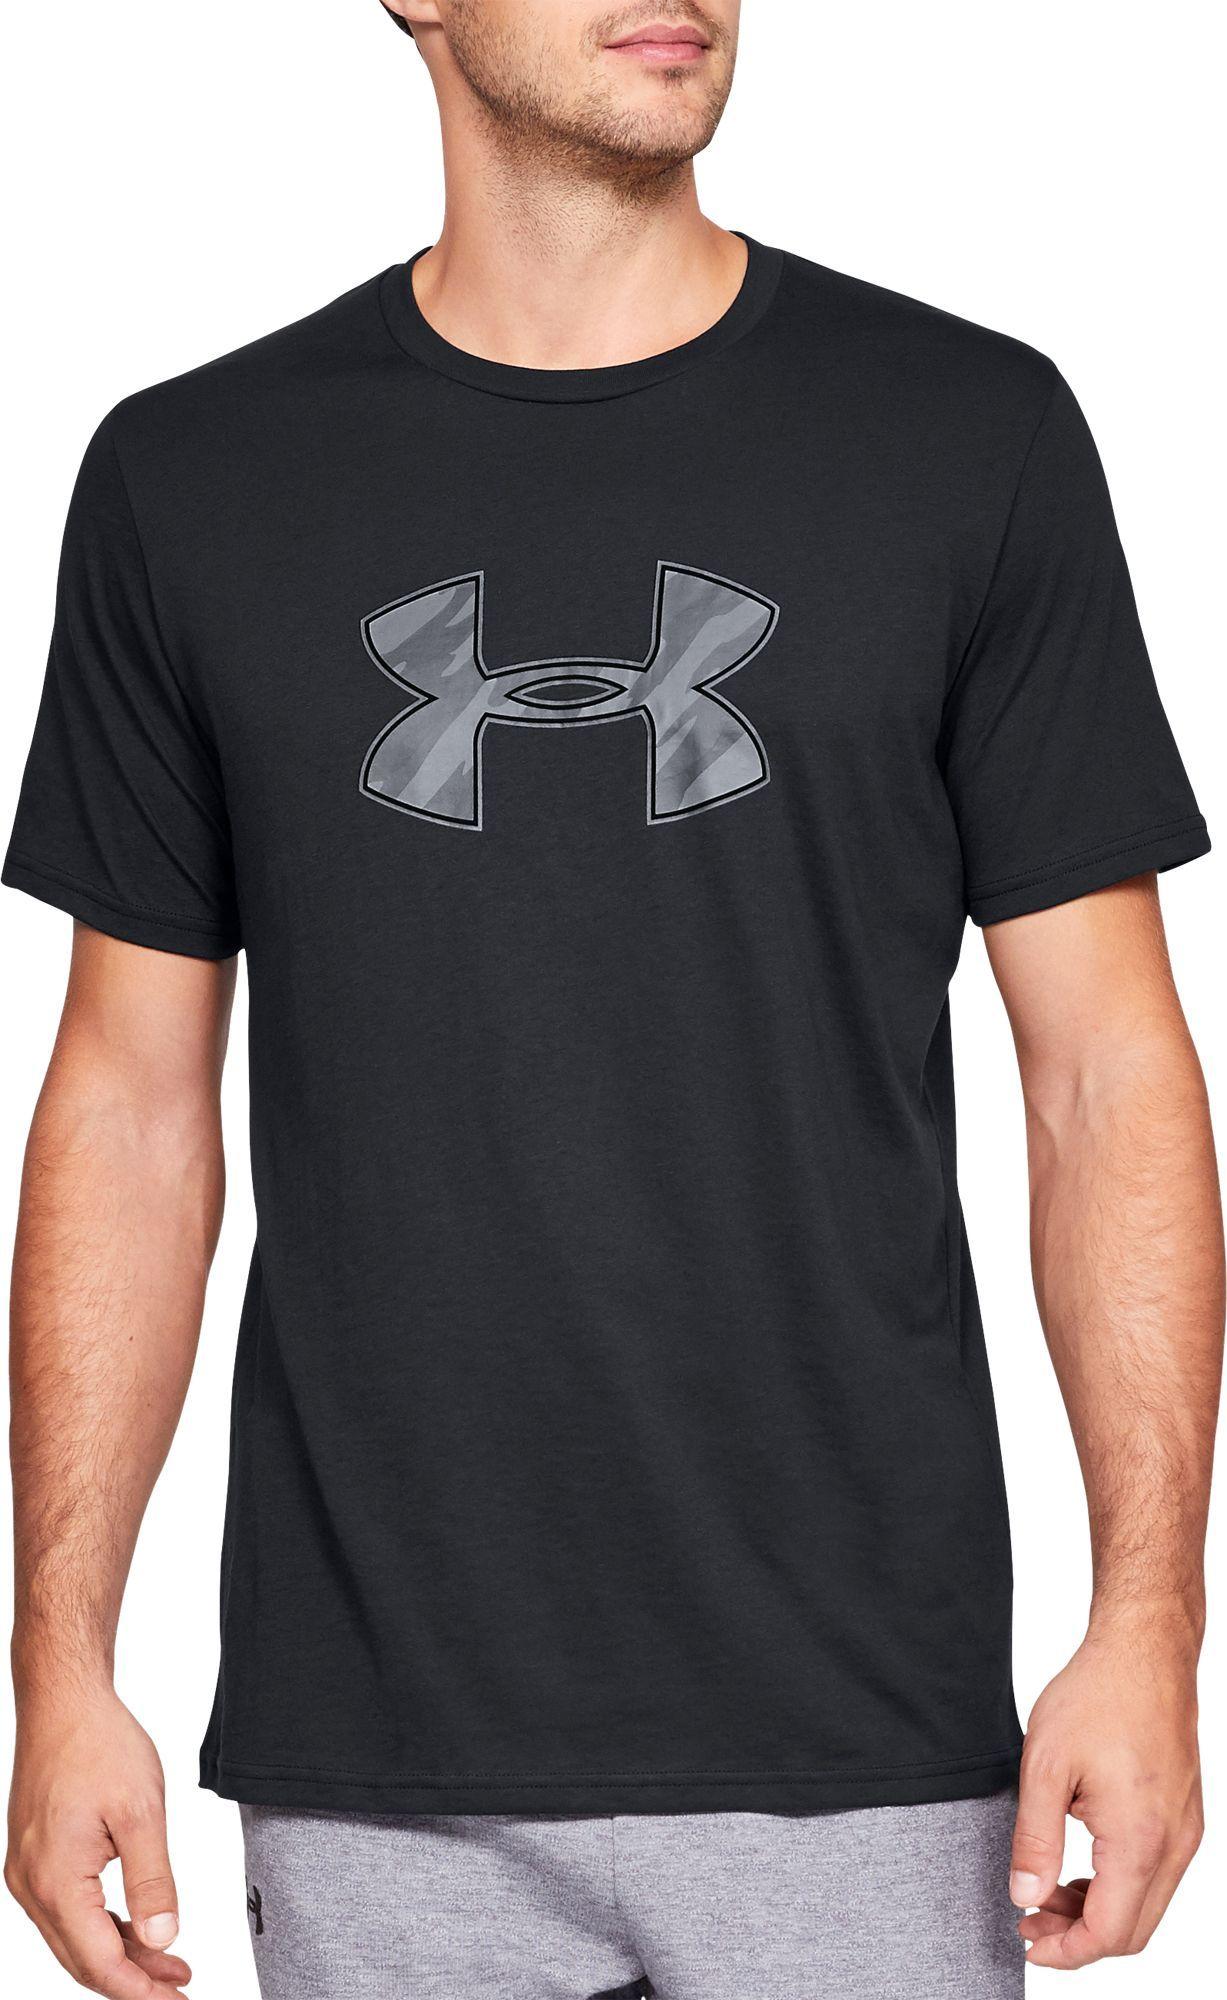 Tradicional Negrita comedia  Under Armour Men's Big Logo Graphic T-Shirt (Regular and Big & Tall) in  2020 | Under armour men, Under armour, Under armour outfits